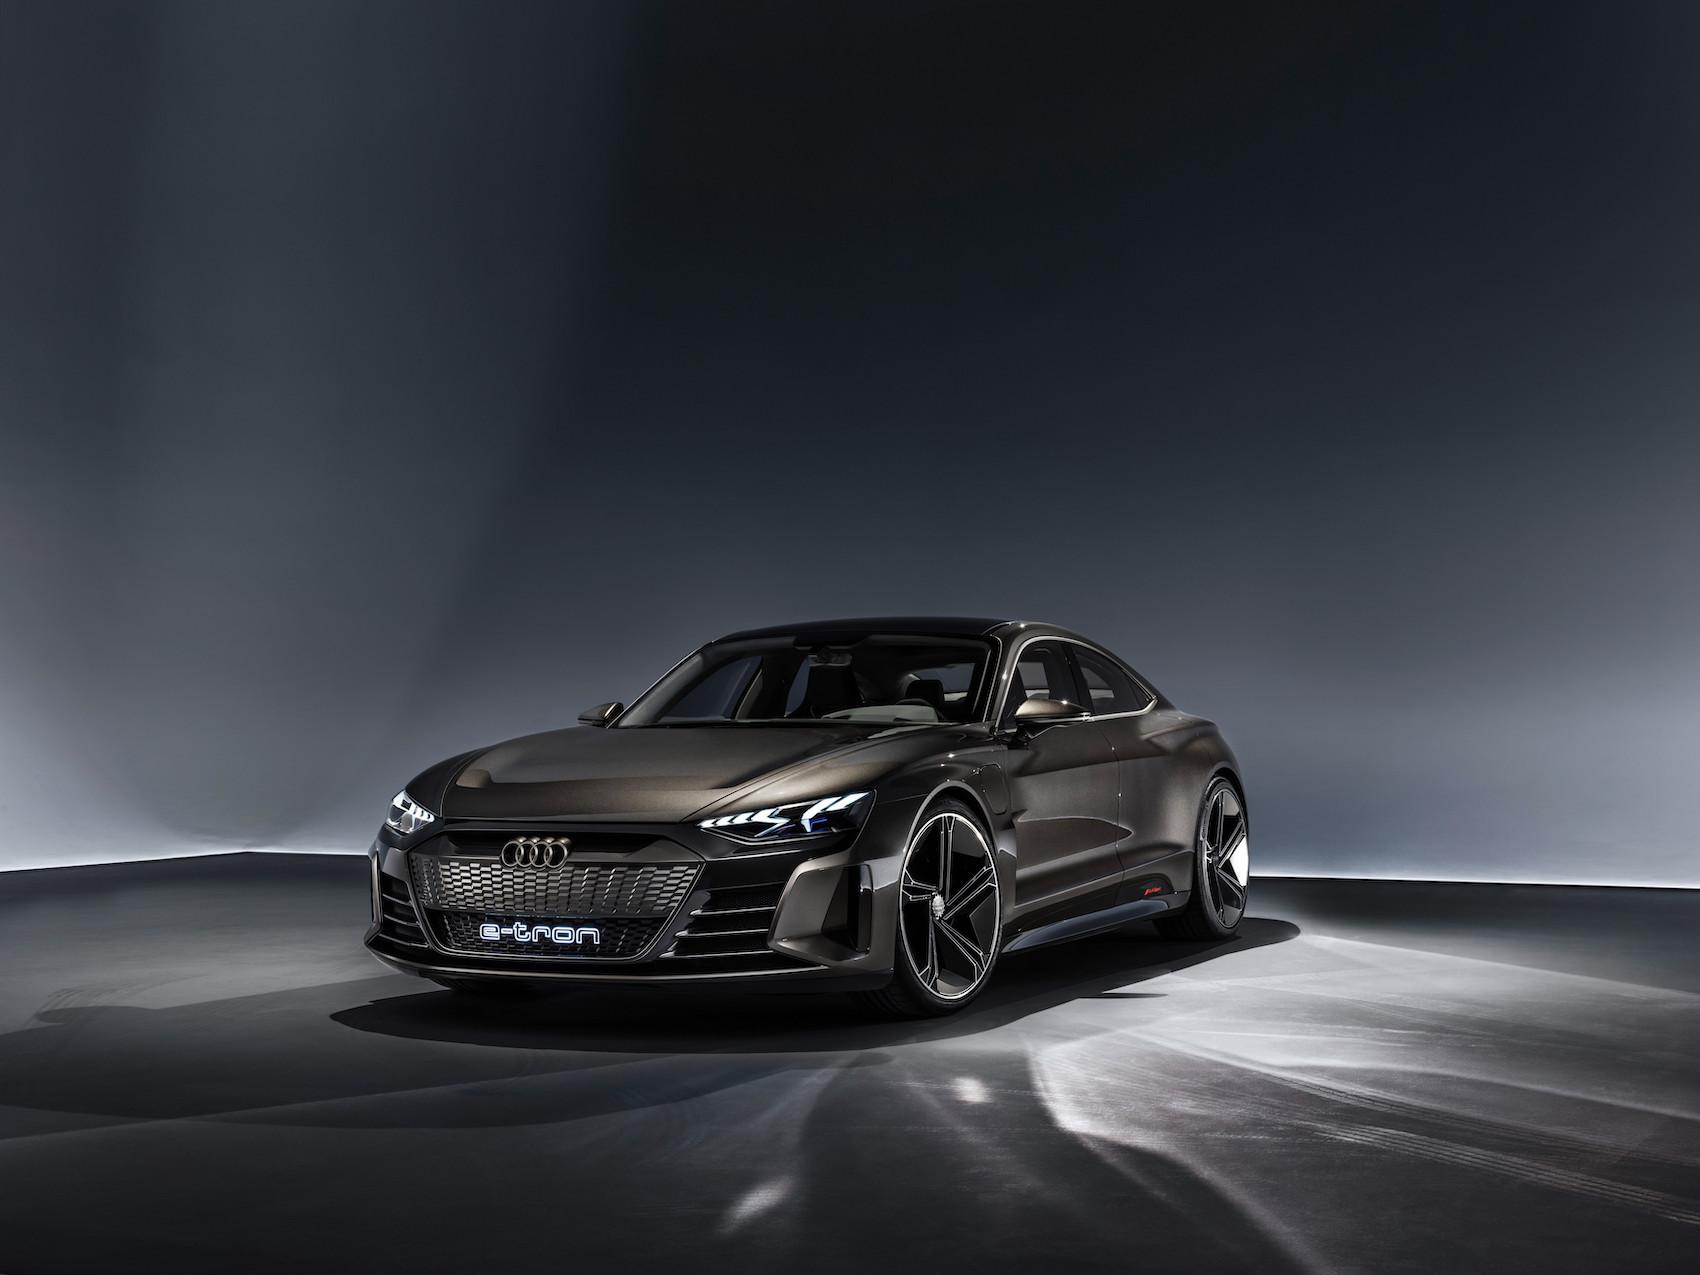 L'Audi e-tron GT concept passa da 0 a 100 km/h in soli 3,5 secondi. (AUDI)